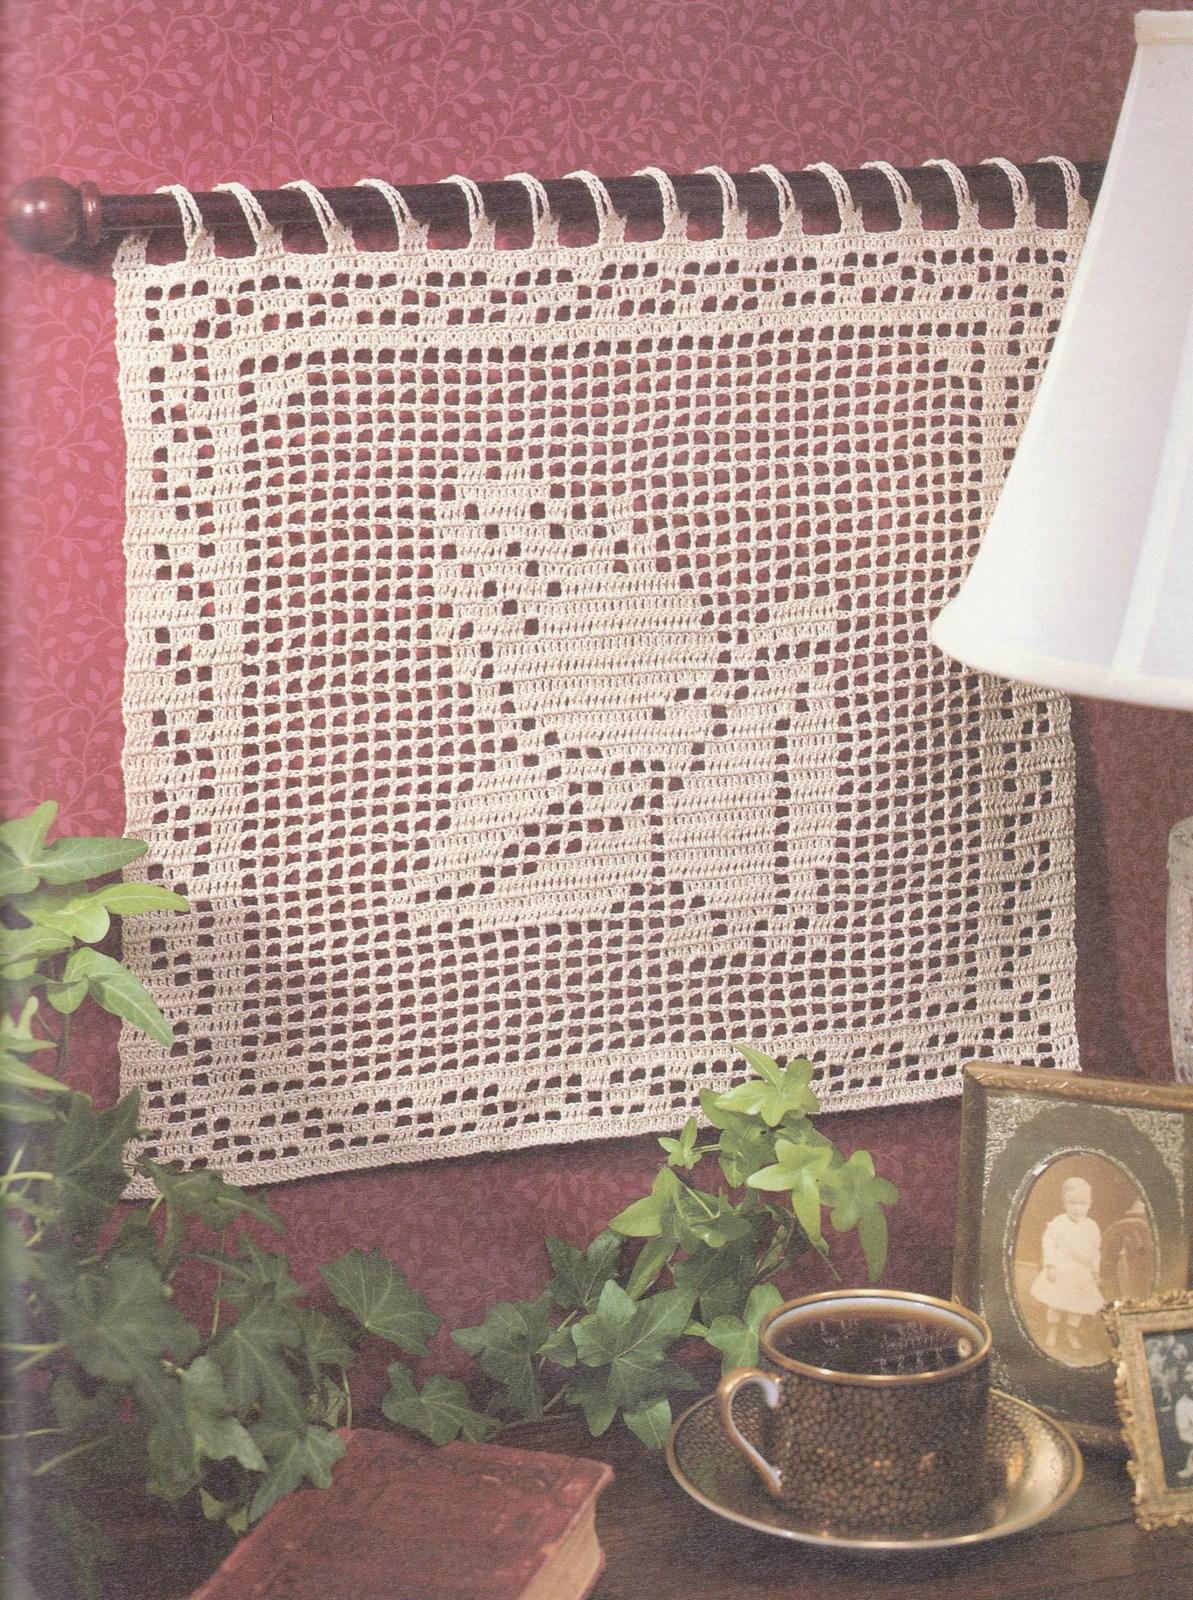 Divine Designs In Filet Crochet Patterns Book Religious Home Decorators Catalog Best Ideas of Home Decor and Design [homedecoratorscatalog.us]